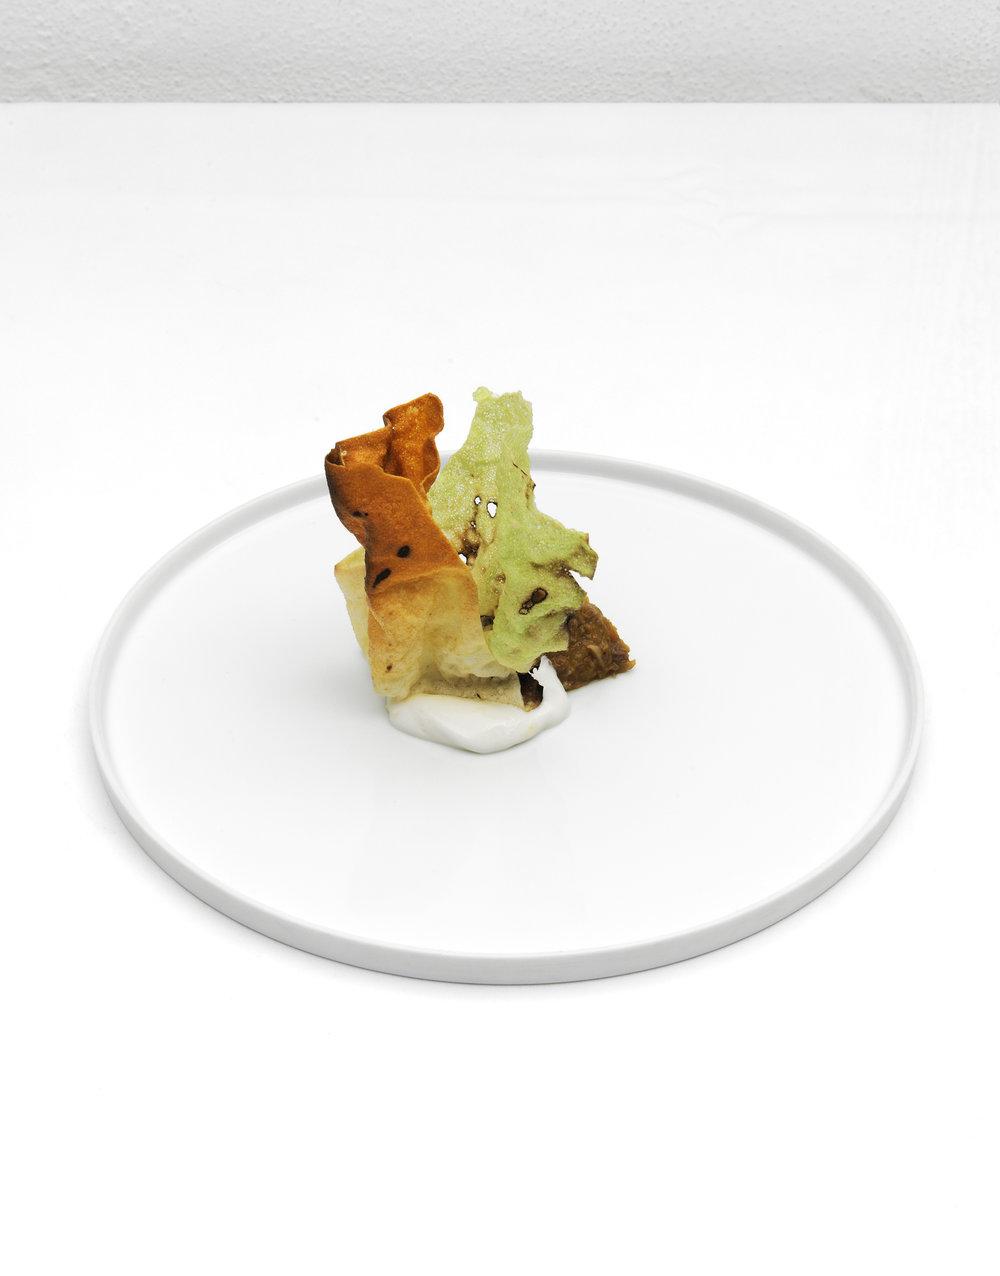 The Crunchy Part of the Lasagna © Paolo Terzi